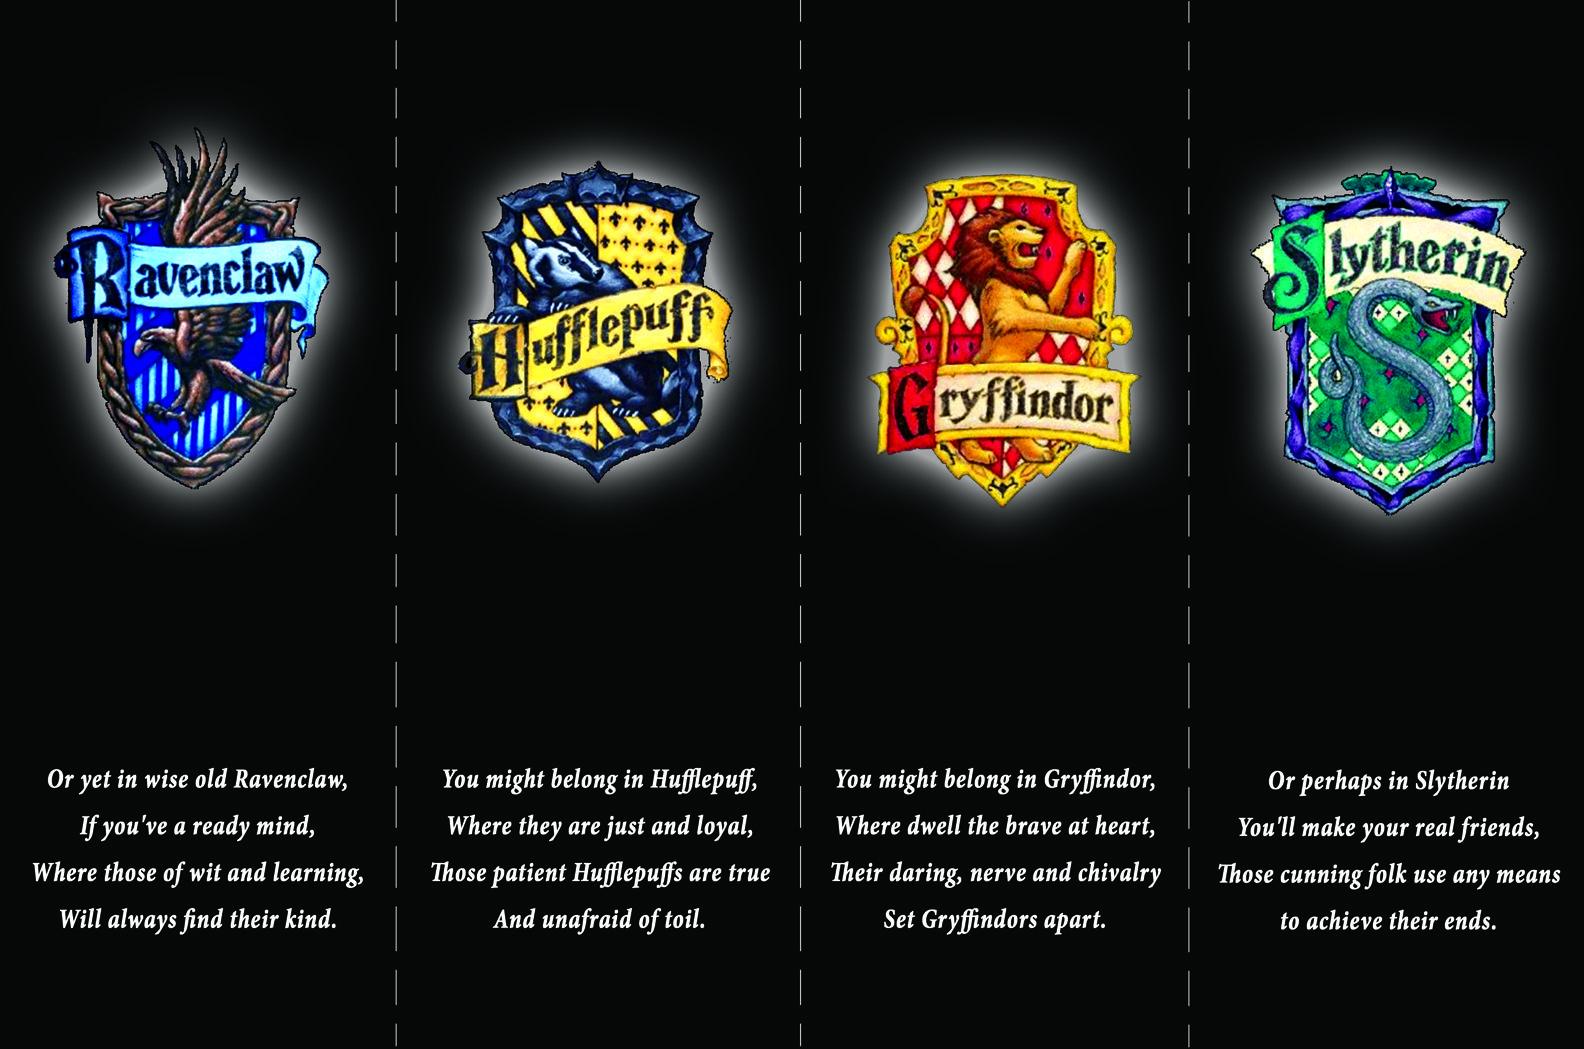 Harry Potter Bookmarks The Four Houses Of Hogwarts From Skiffleboom Com Harry Potter Bookmark Harry Potter Hogwarts Houses Harry Potter Houses